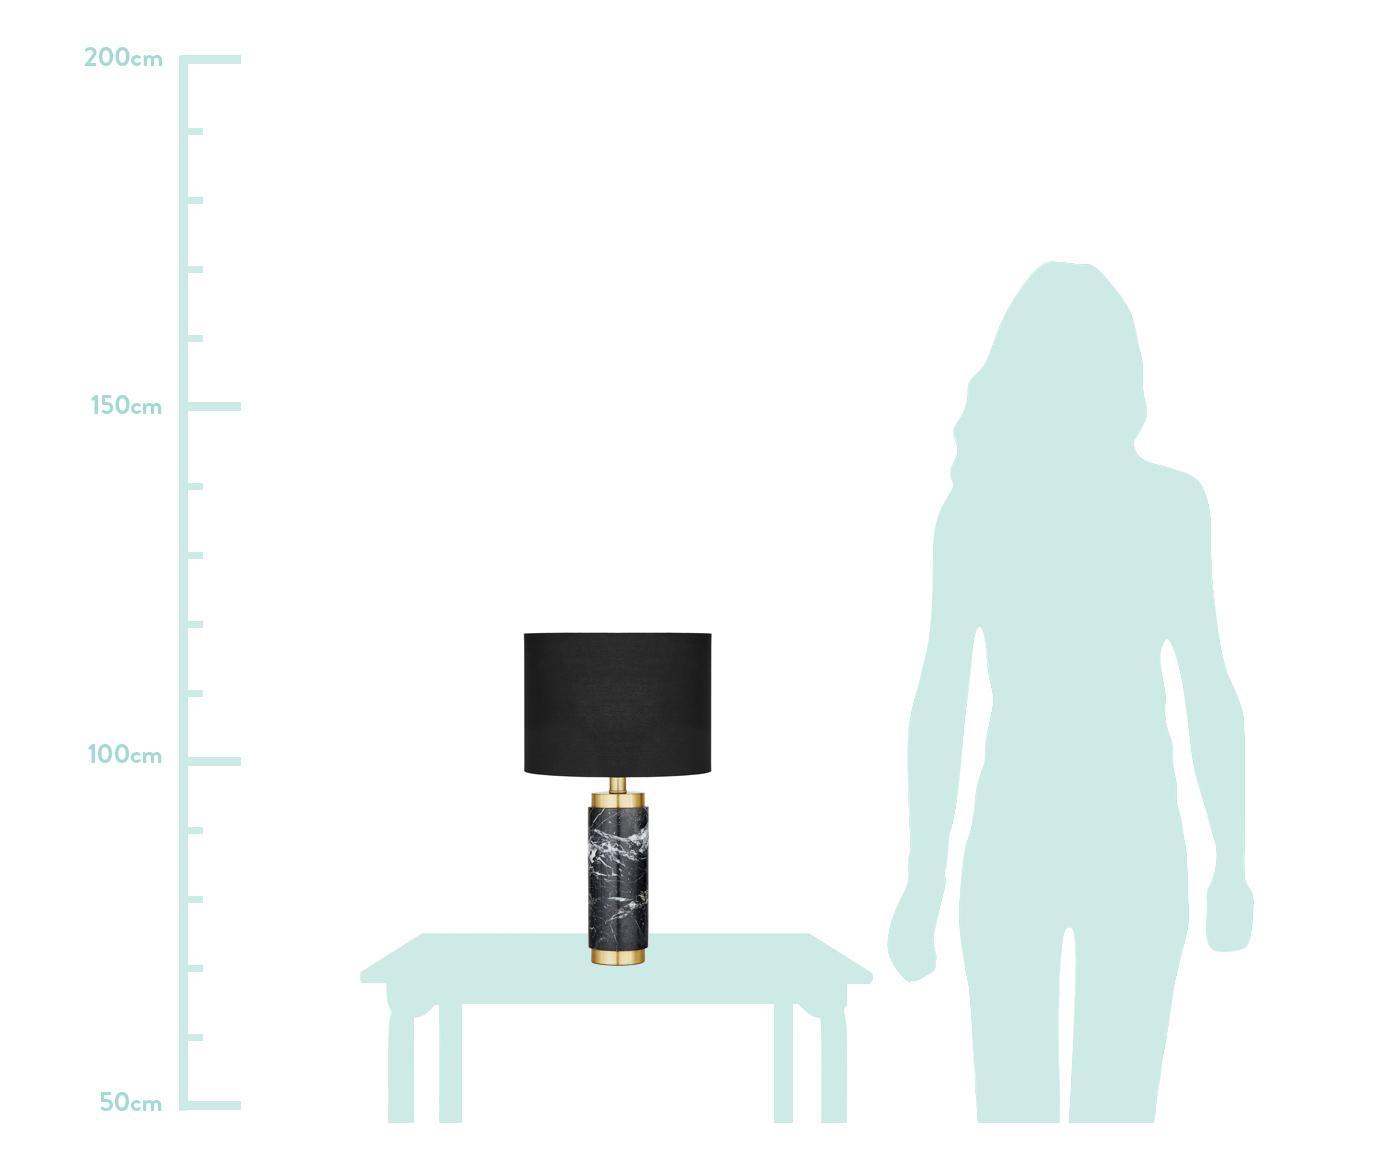 Marmeren tafellamp Miranda, Lampenkap: textiel, Lampvoet: marmer, geborsteld messin, Wit, zwart marmer, Ø 28 x H 48 cm